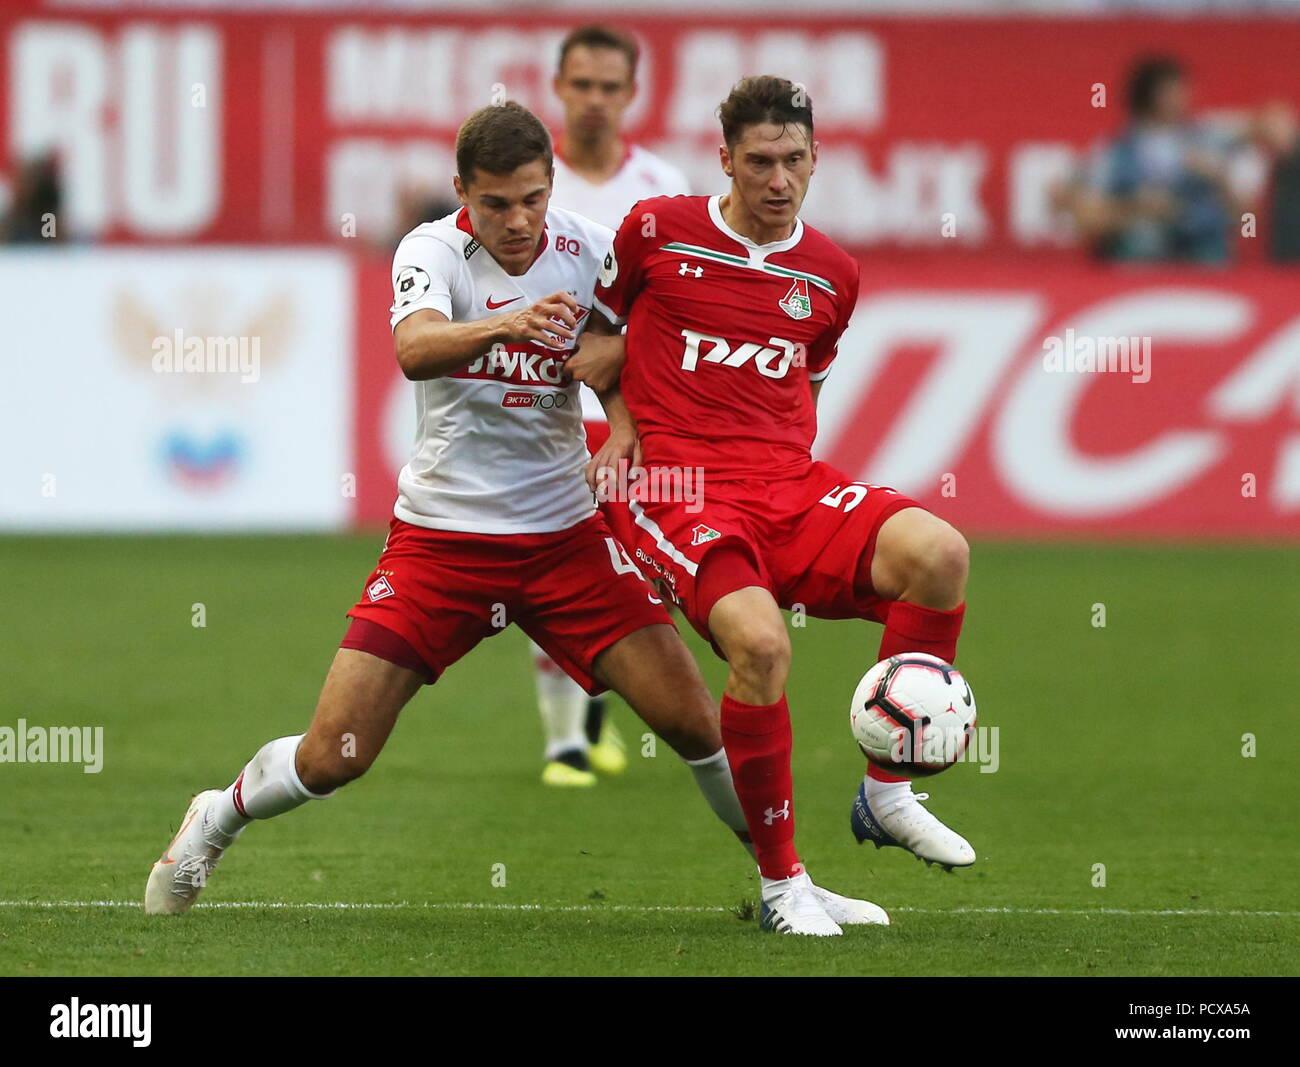 Match Spartak - Lokomotiv 2018 43